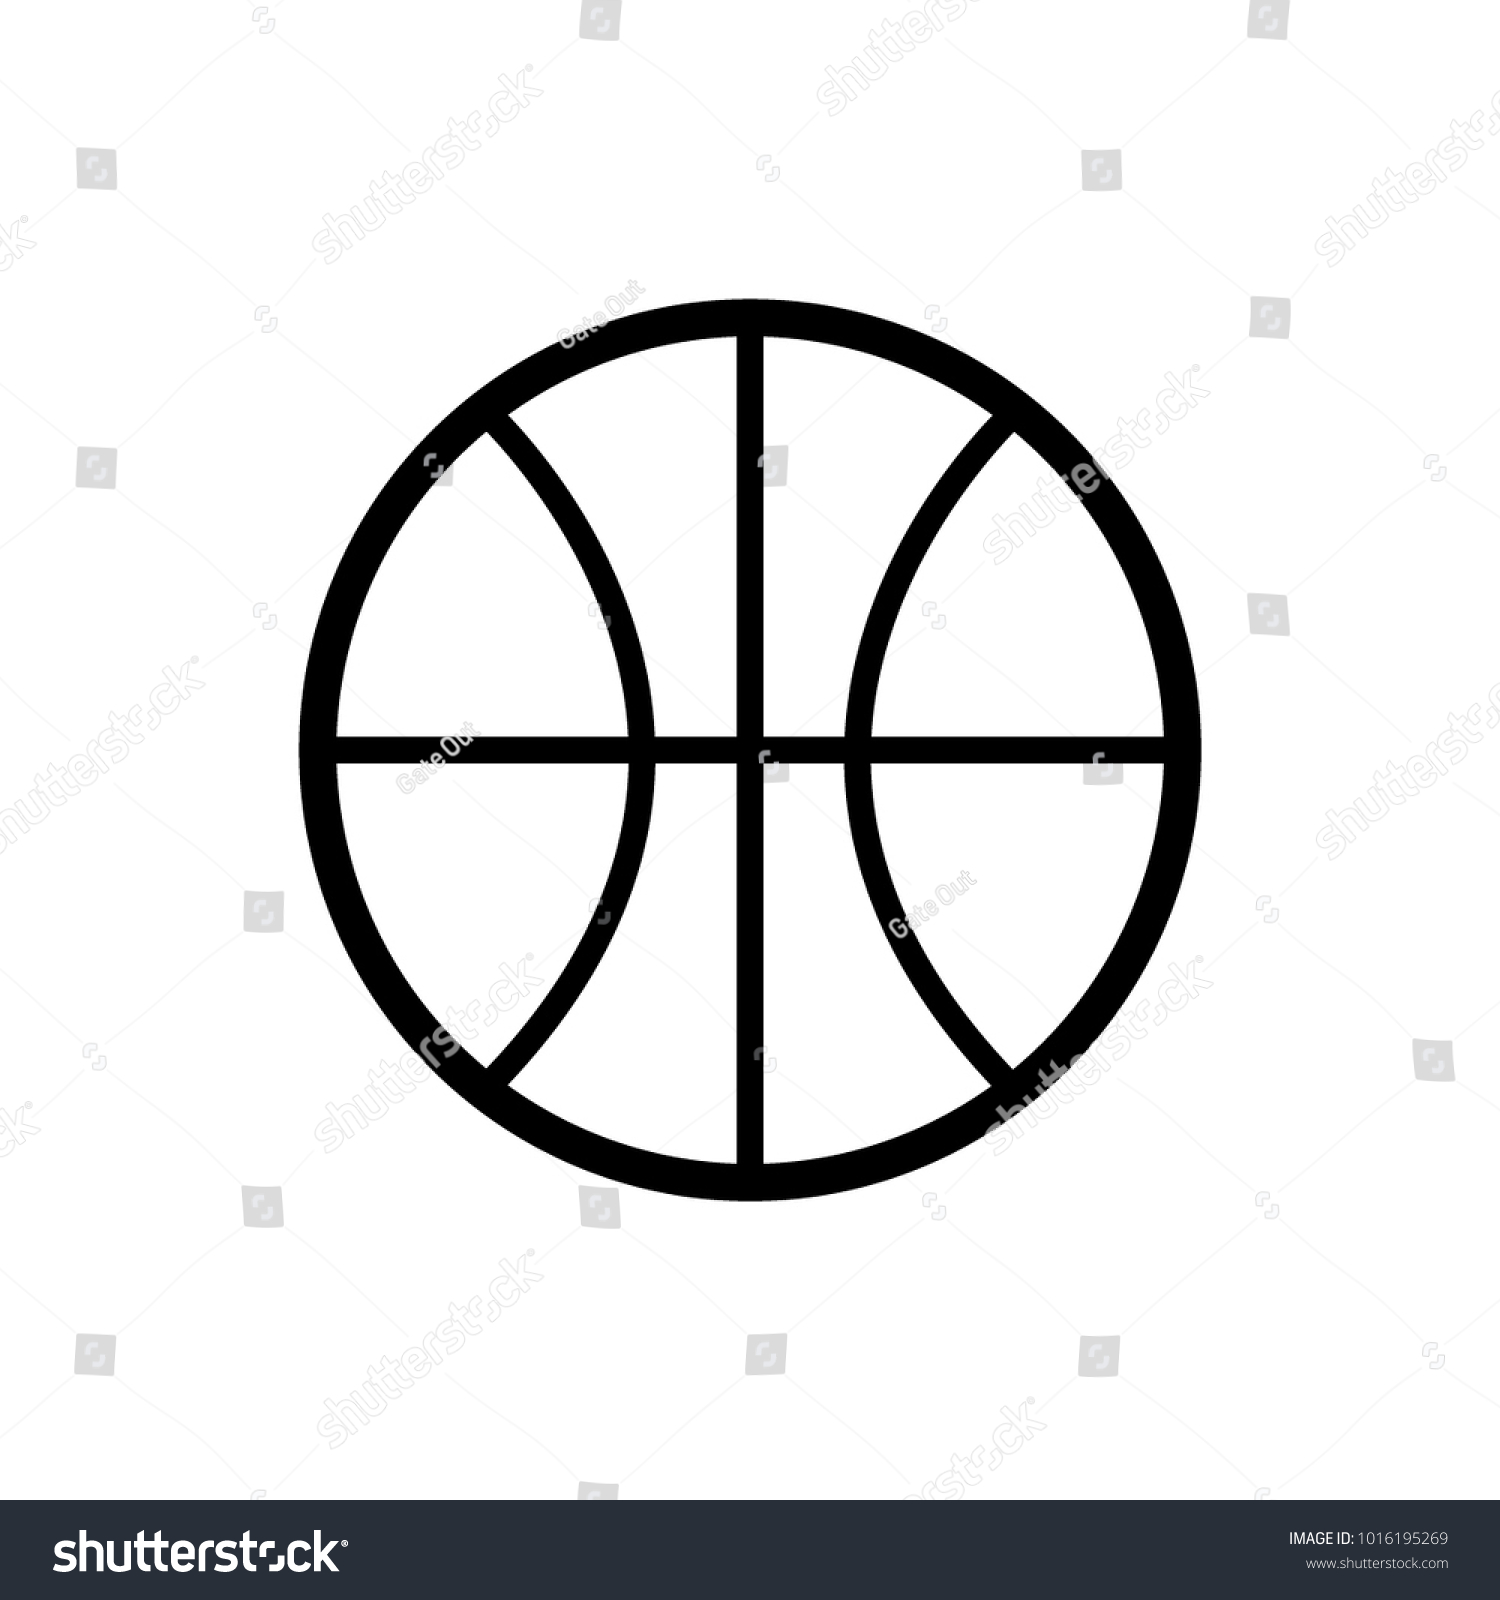 Icon Basketball Template Stock Vector 1016195269 - Shutterstock